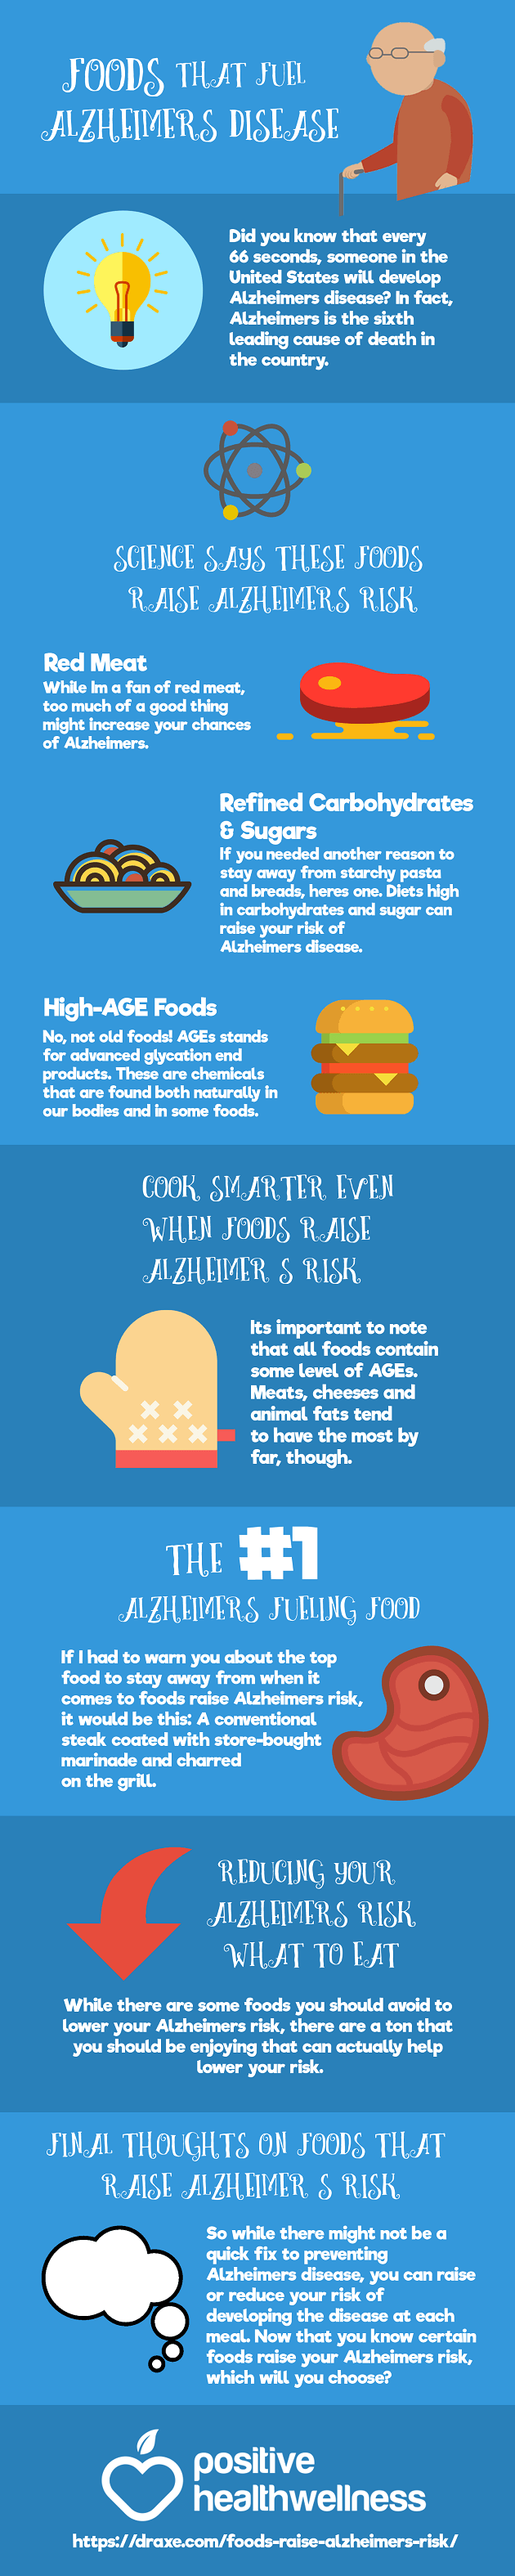 Foods that Fuel Alzheimer